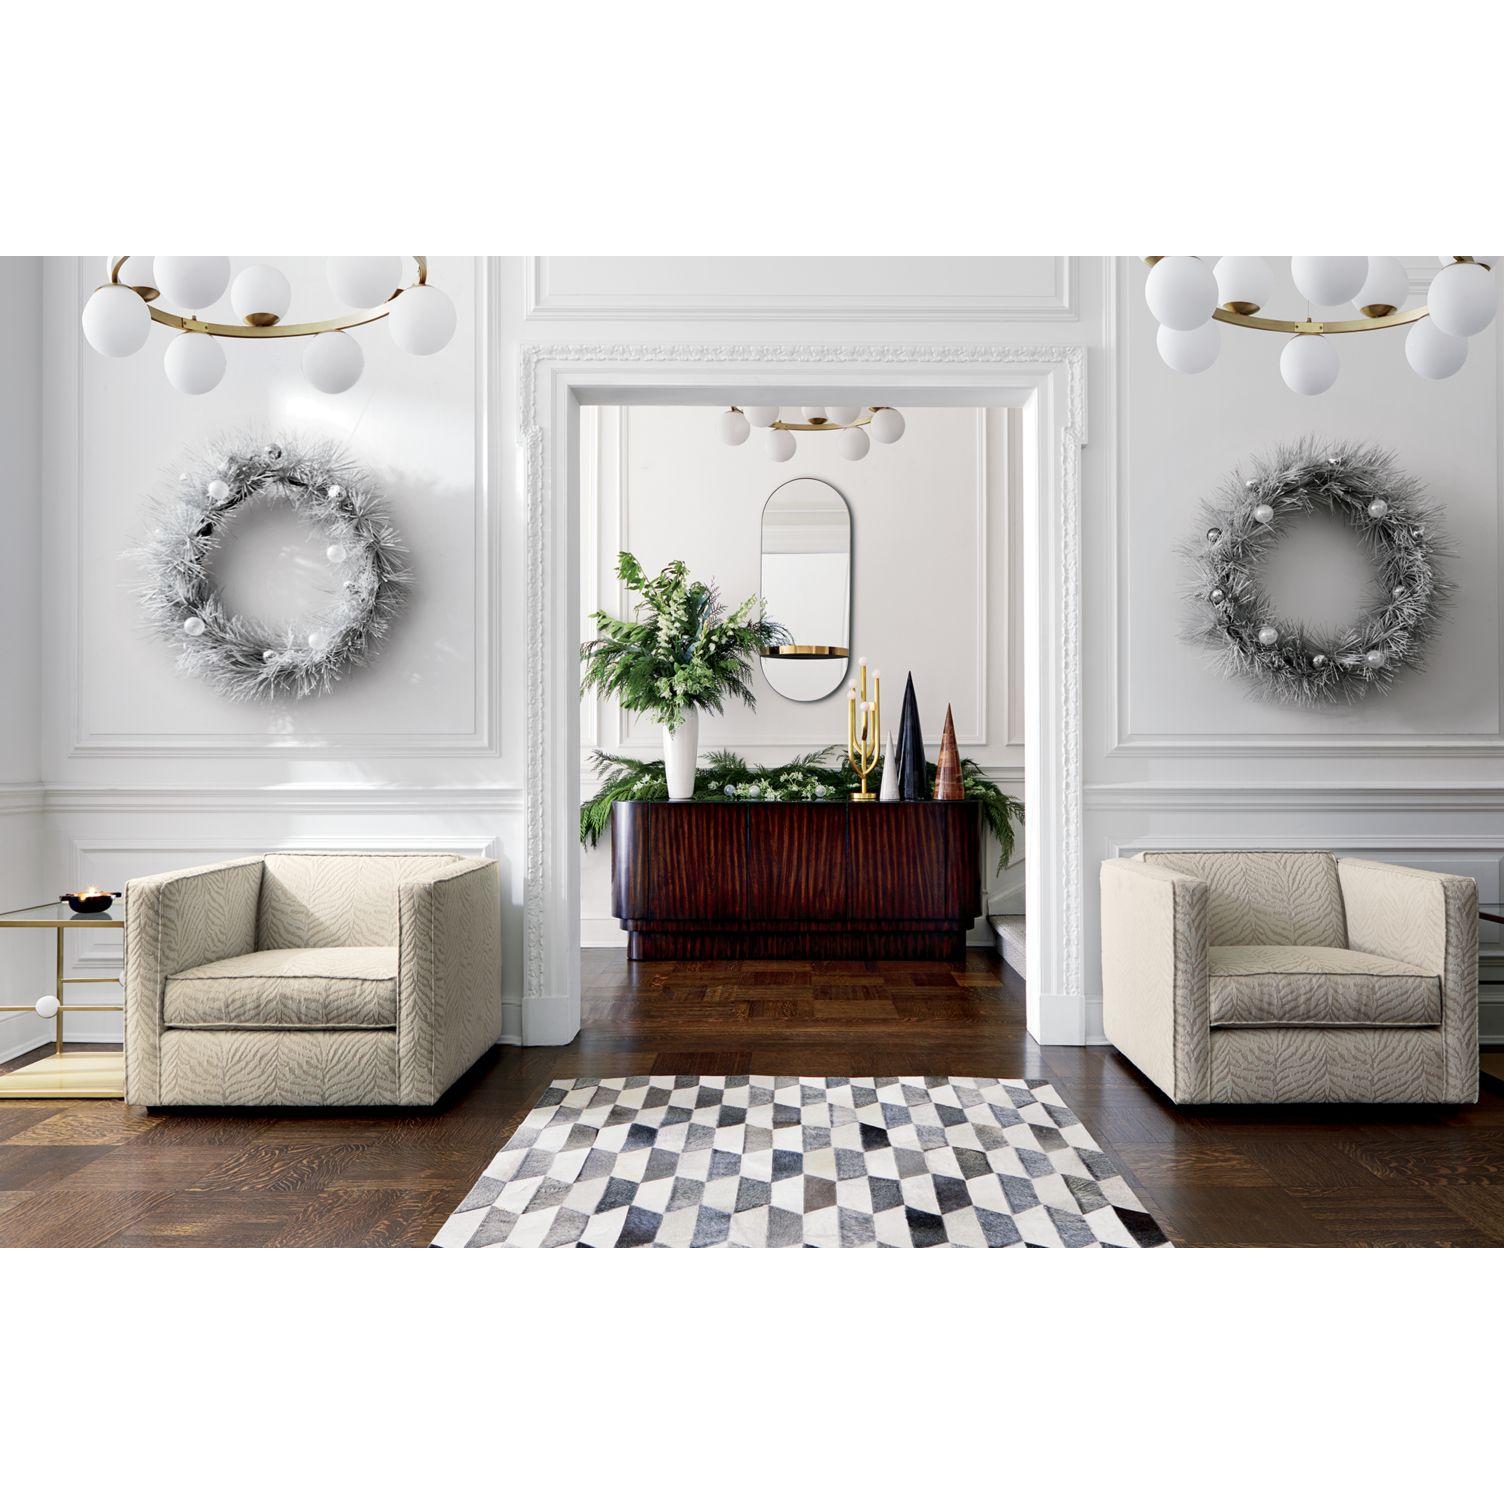 Glamorous holiday interior